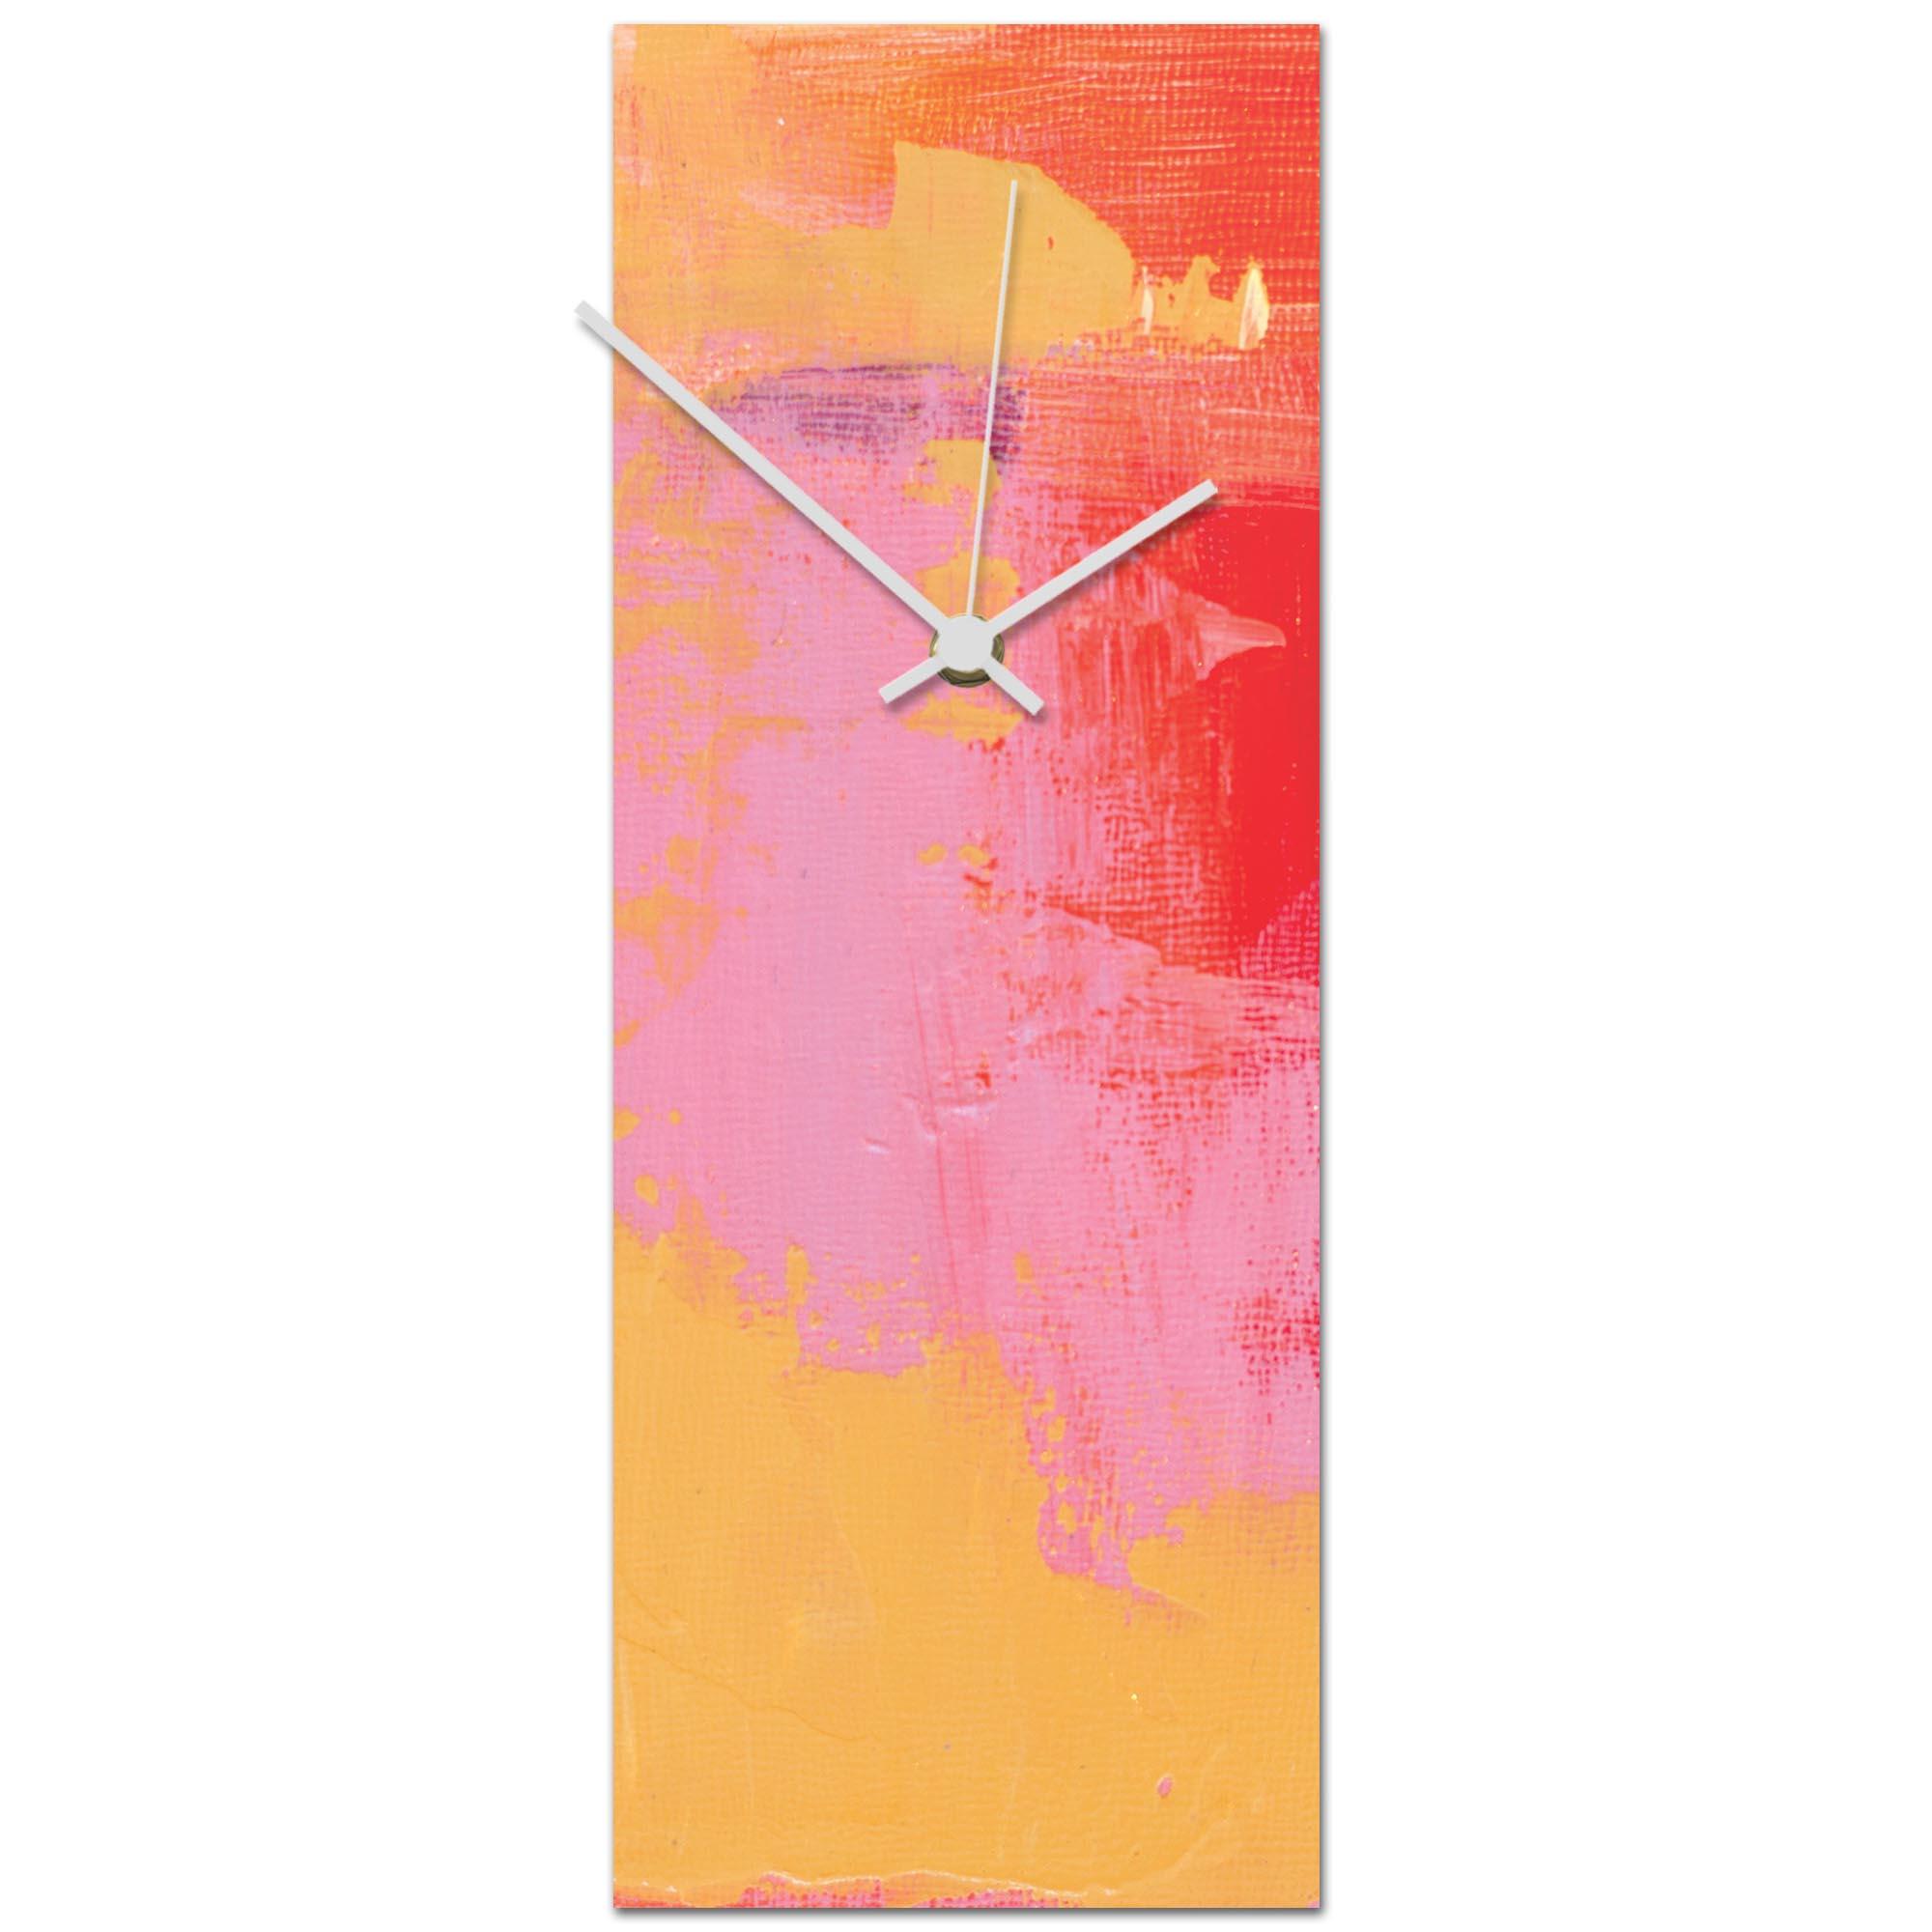 Urban Warmth v7 Clock 6x16in. Metal